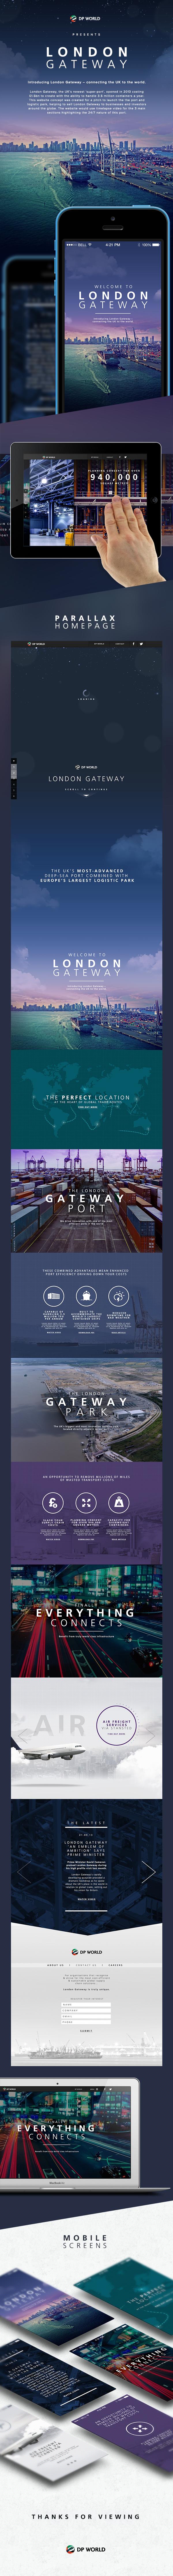 Cool Web Design on the Internet, London Gateway. #webdesign #webdevelopment #website @ http://www.pinterest.com/alfredchong/web-design/